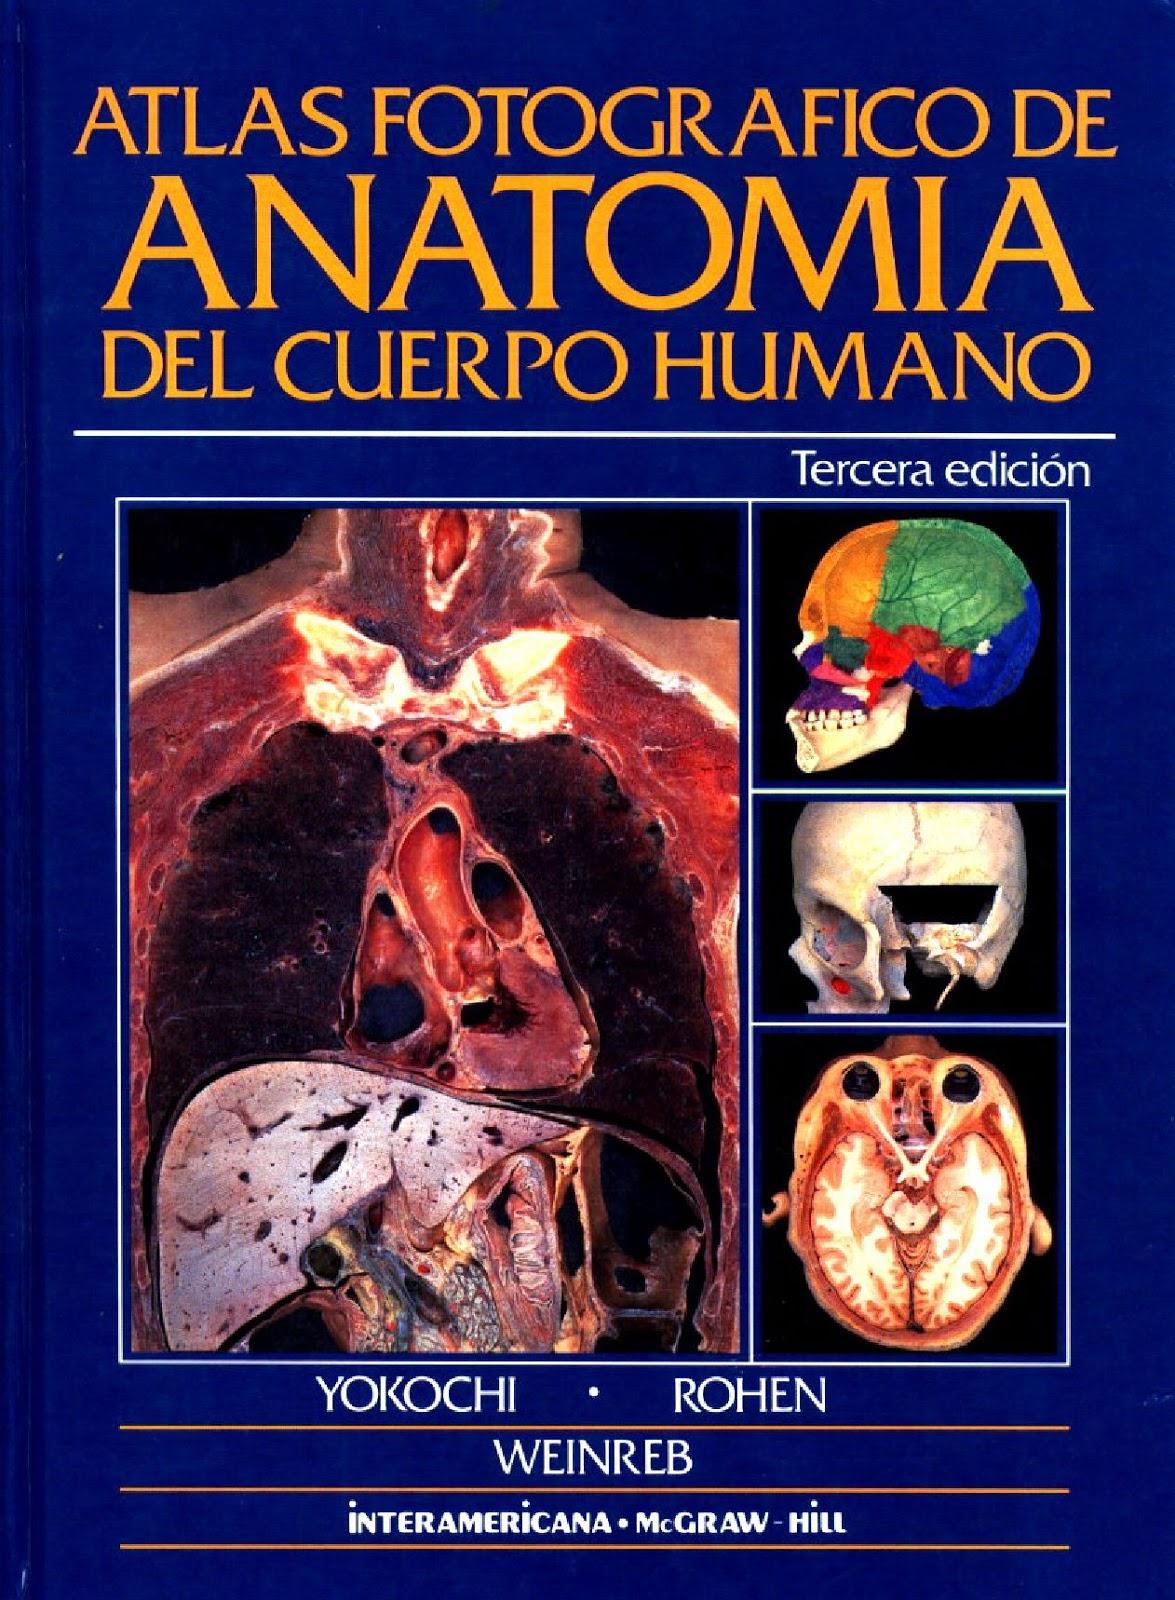 ROHEN YOKOCHI | ATLAS DE ANATOMIA | Libros De Medicina UNICAH